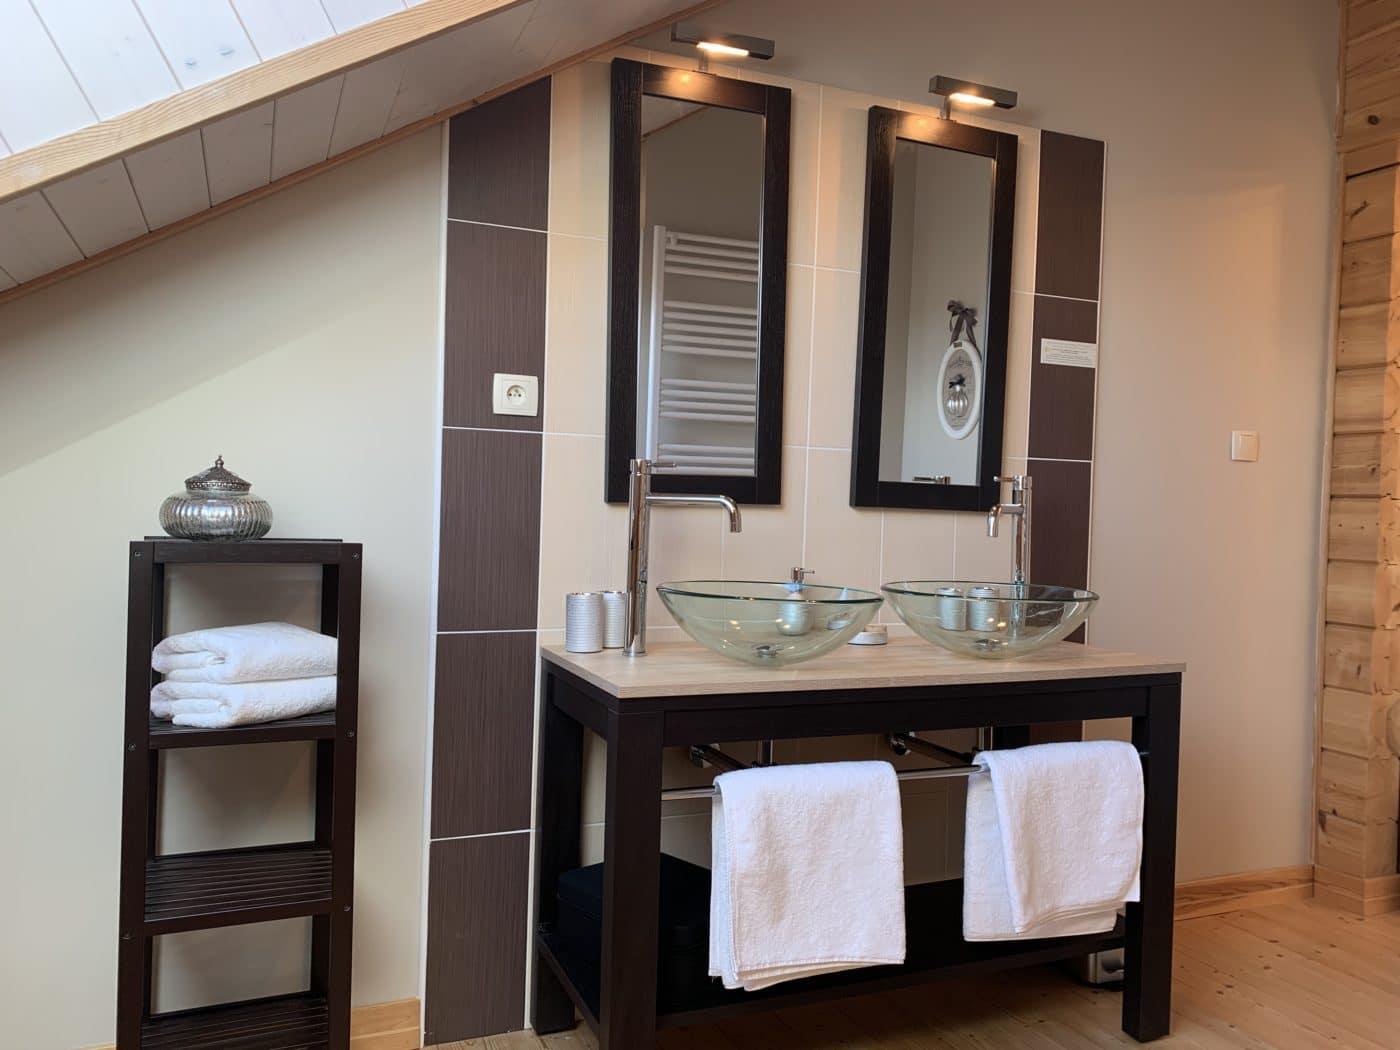 Salle de bain-O-refuge-Divin-chambre d'hôte-cher-bannay